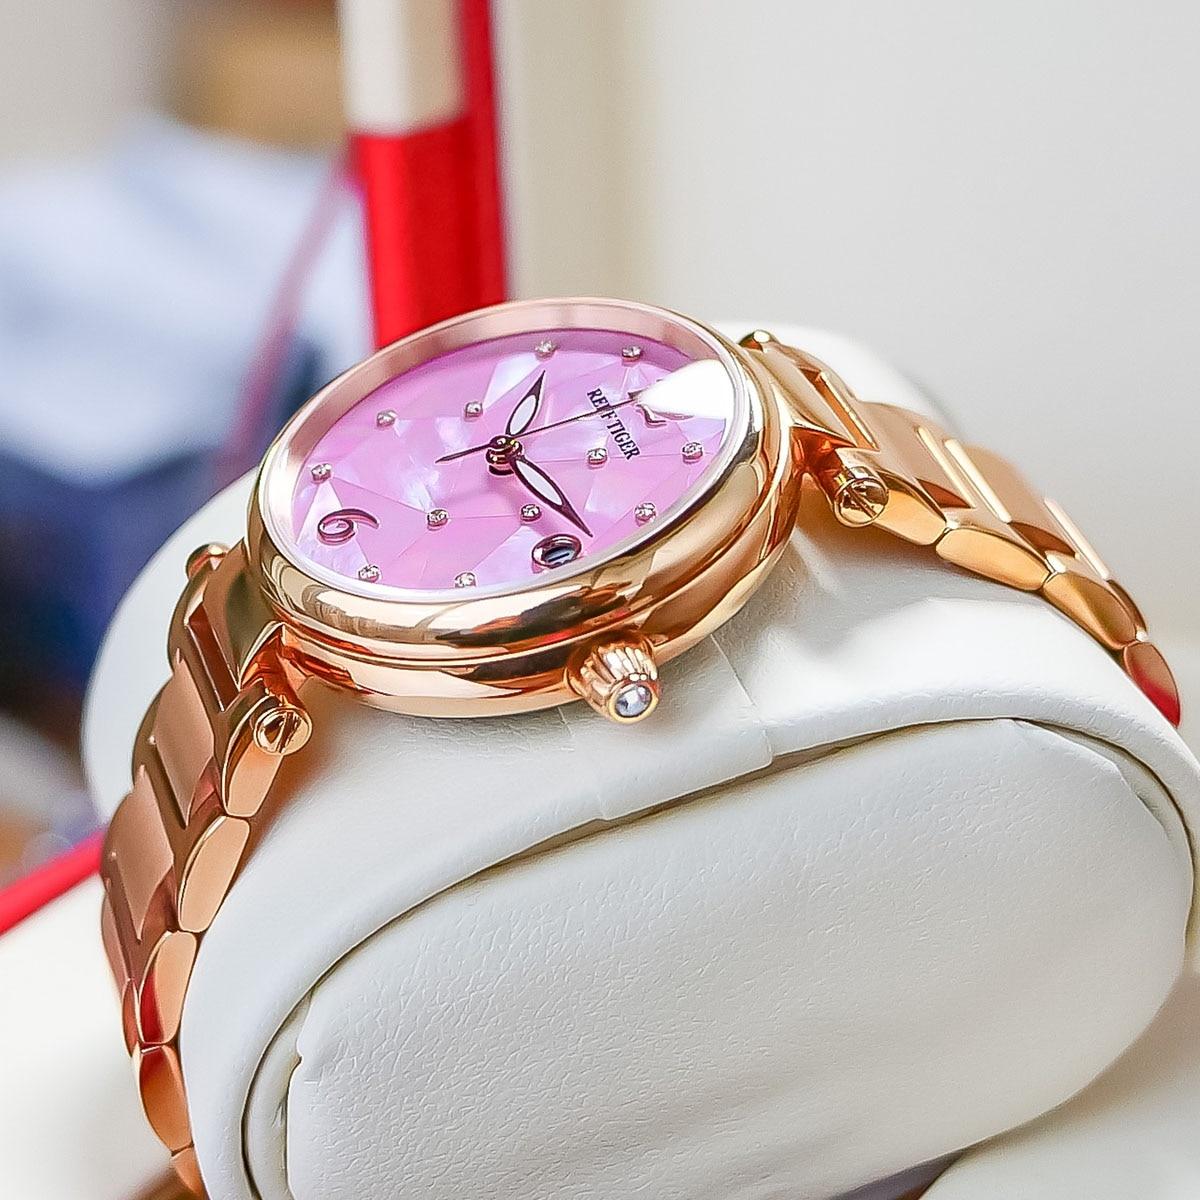 Reef Tiger/ RT Pink Dial Rose Gold Luxury Fashion Diamond Women Watches Stainless Steel Bracelet Mechanical Watch RGA1584 enlarge